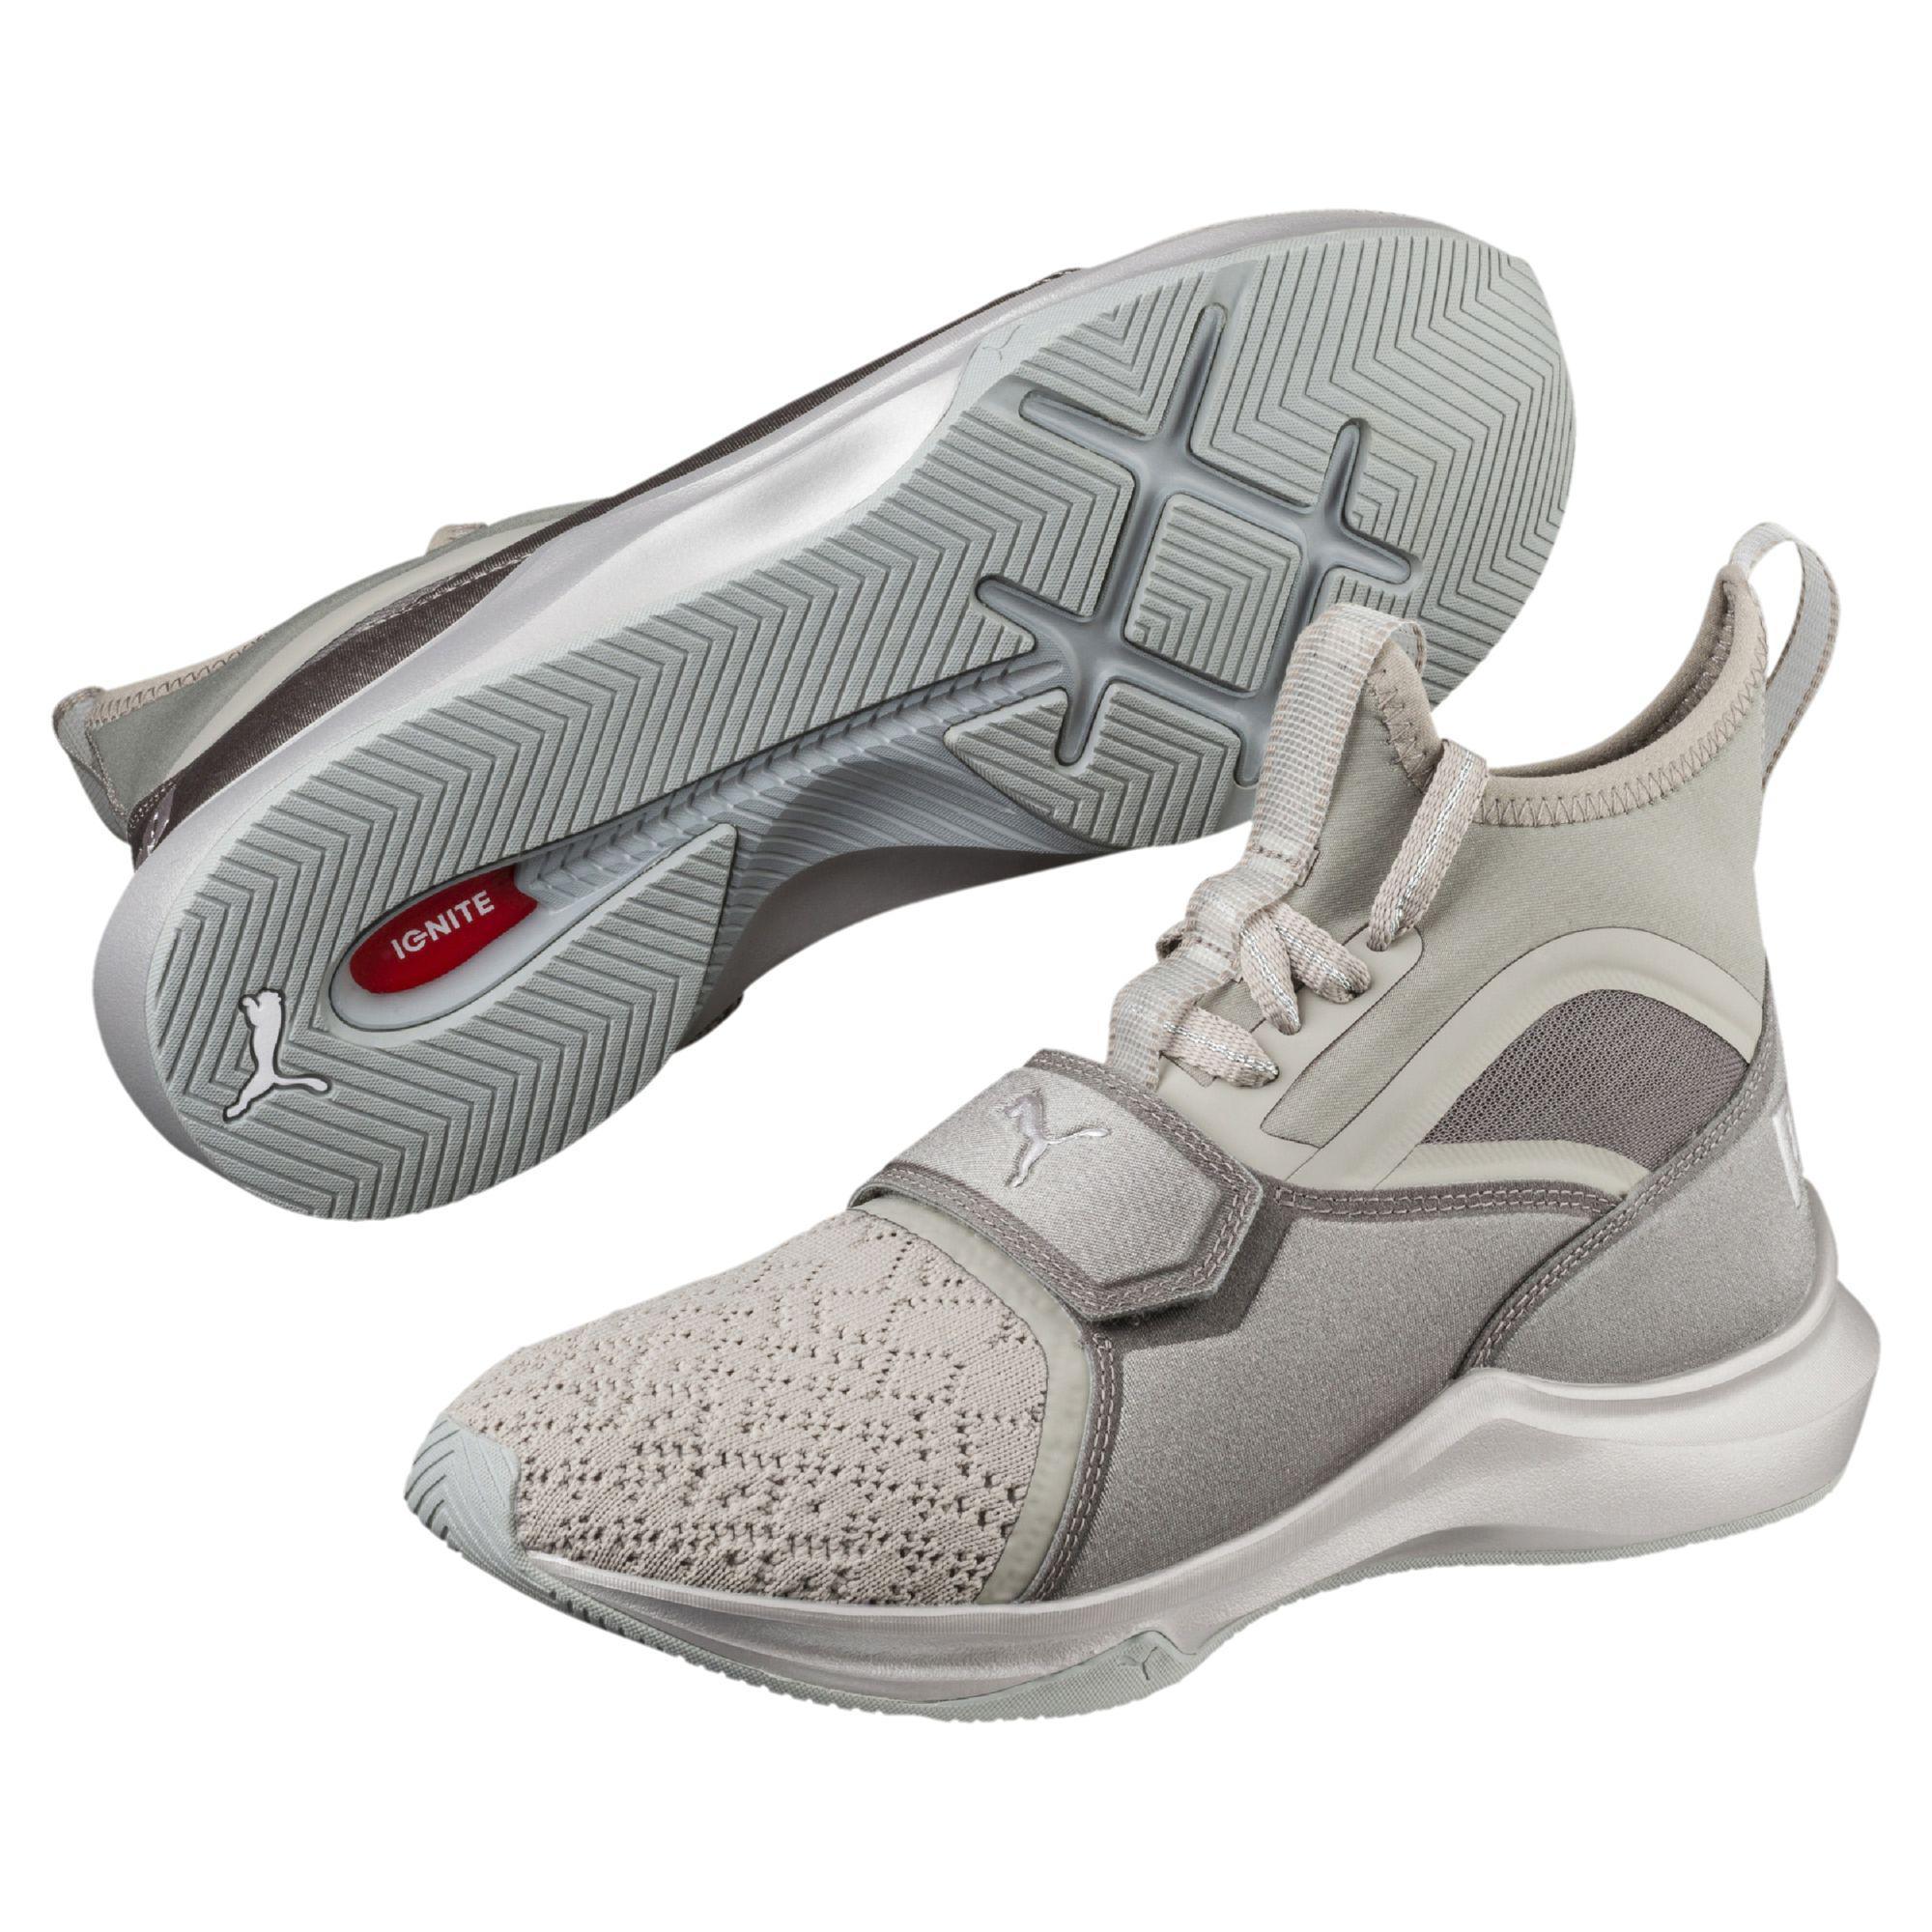 PumaPHENOM EN POINTE - Sports shoes - rock ridge/metallic beige yxpBHYEcB